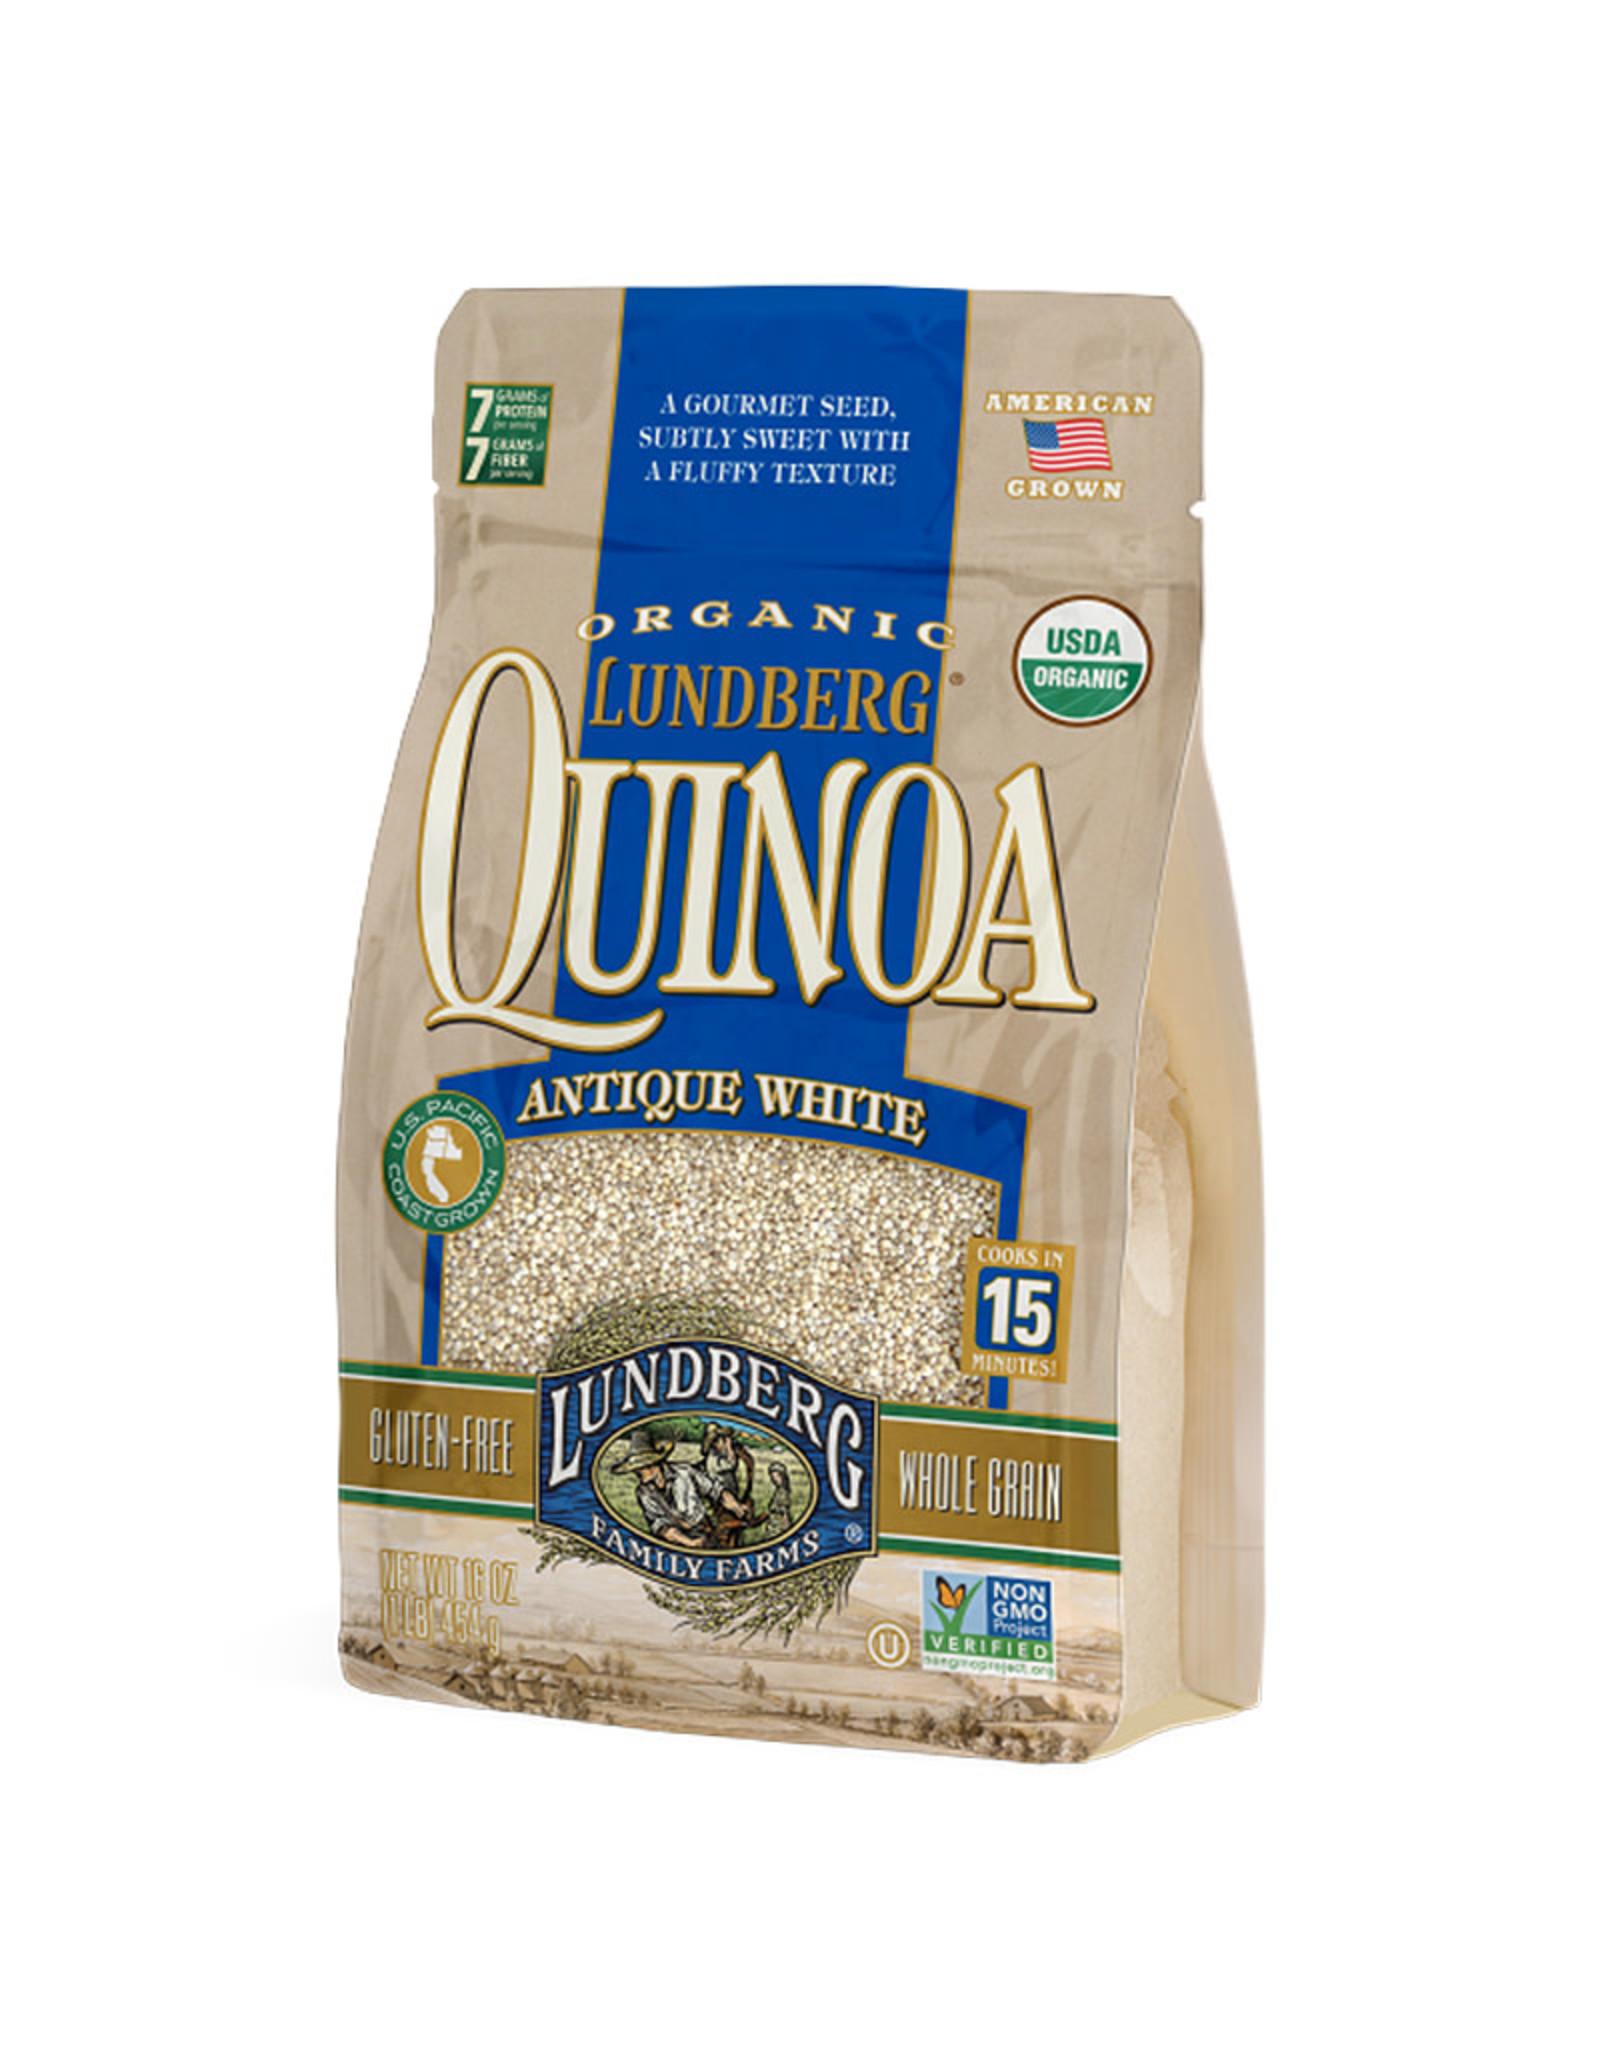 Lundberg Lundberg - Organic Quinoa, Antique White (454g)